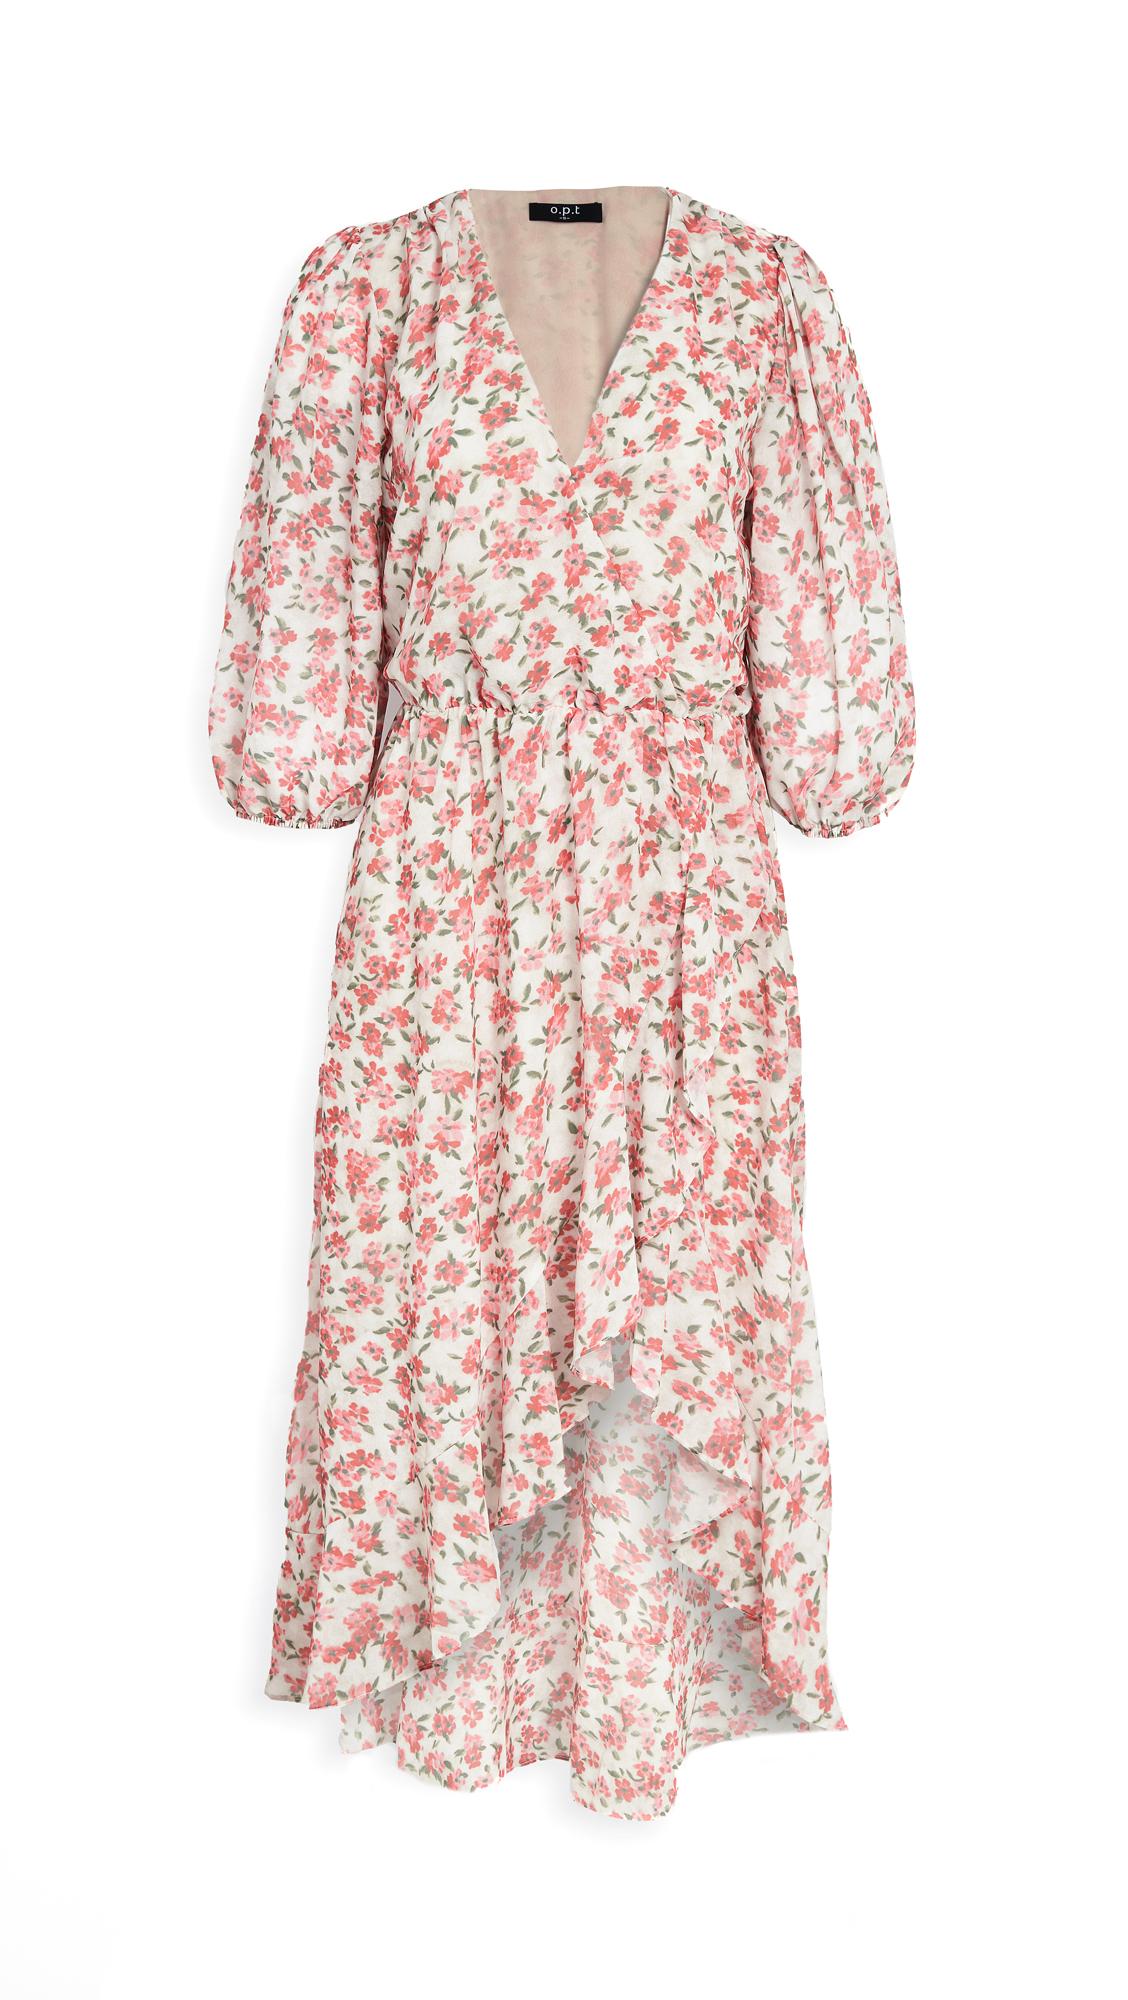 OPT Abella Dress - 30% Off Sale